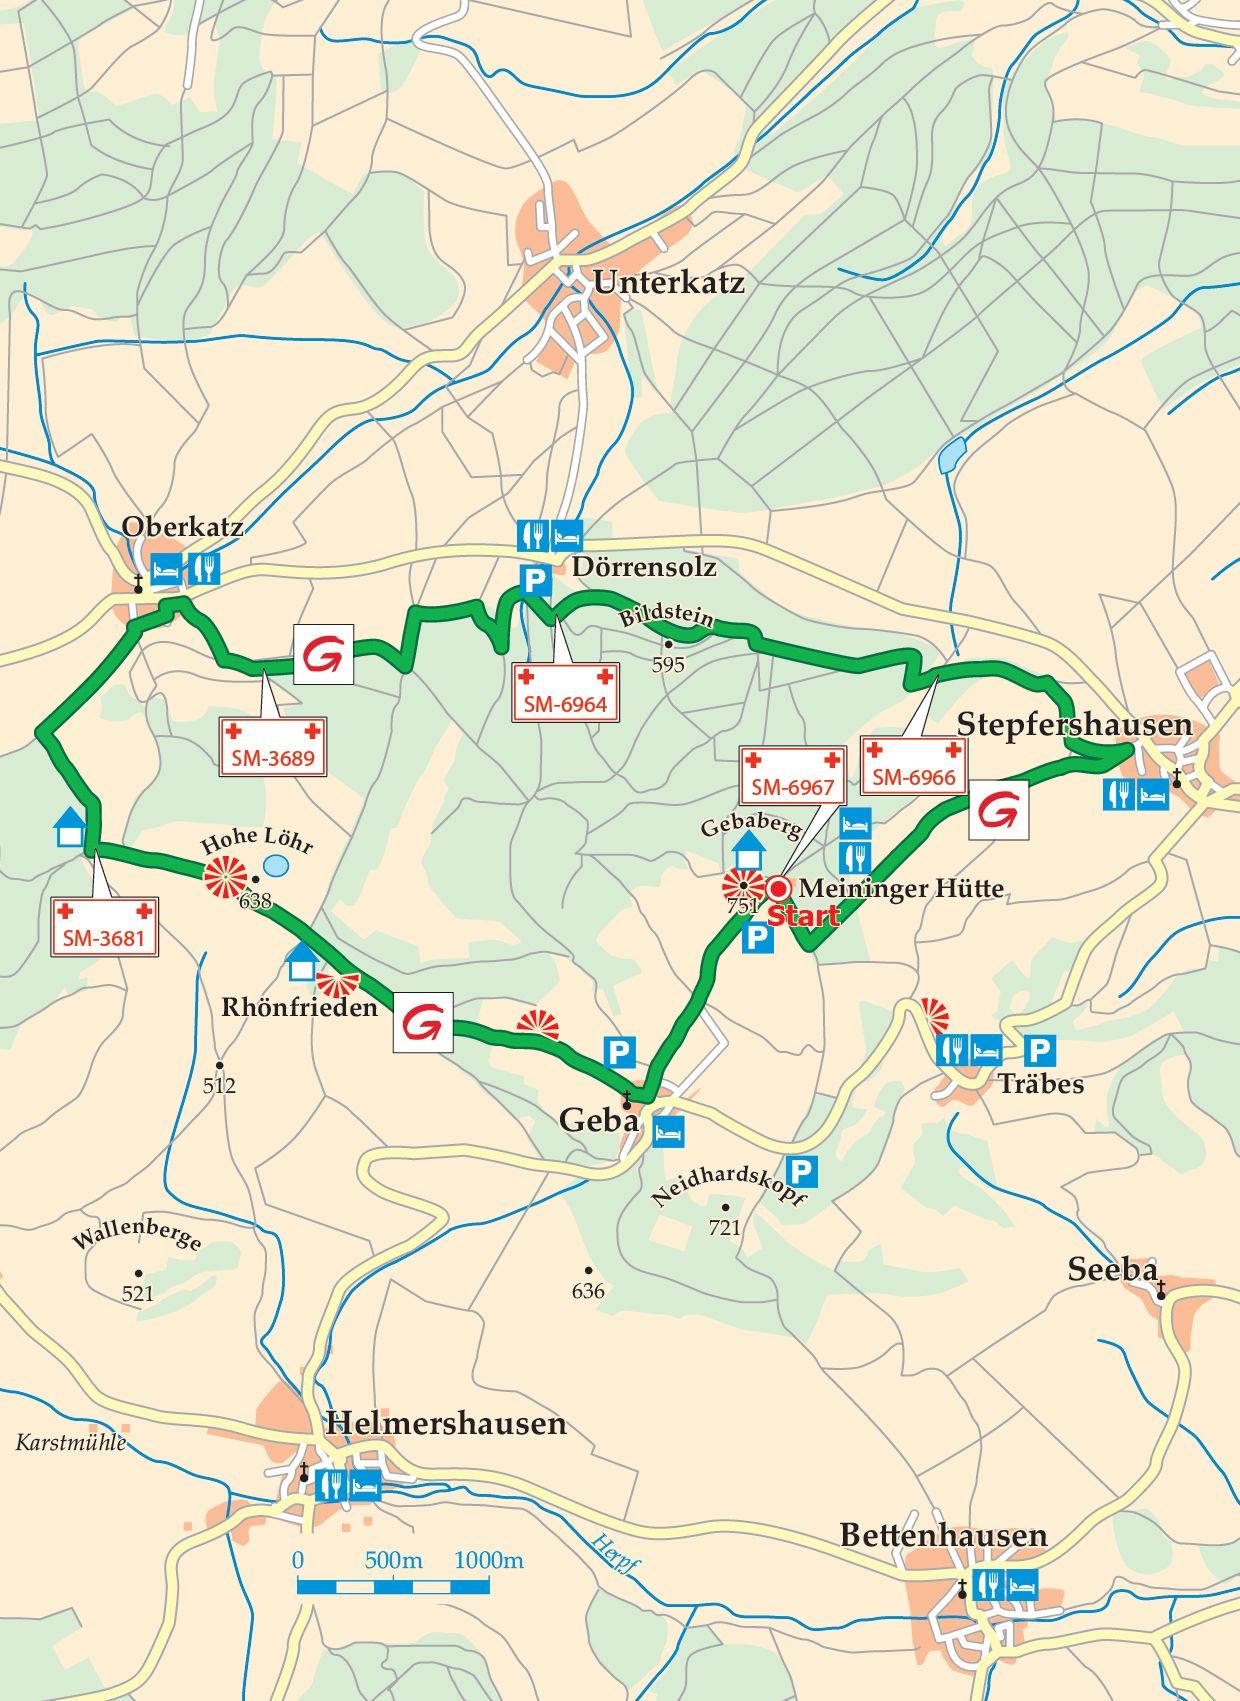 Extratour Gebaweg Karte